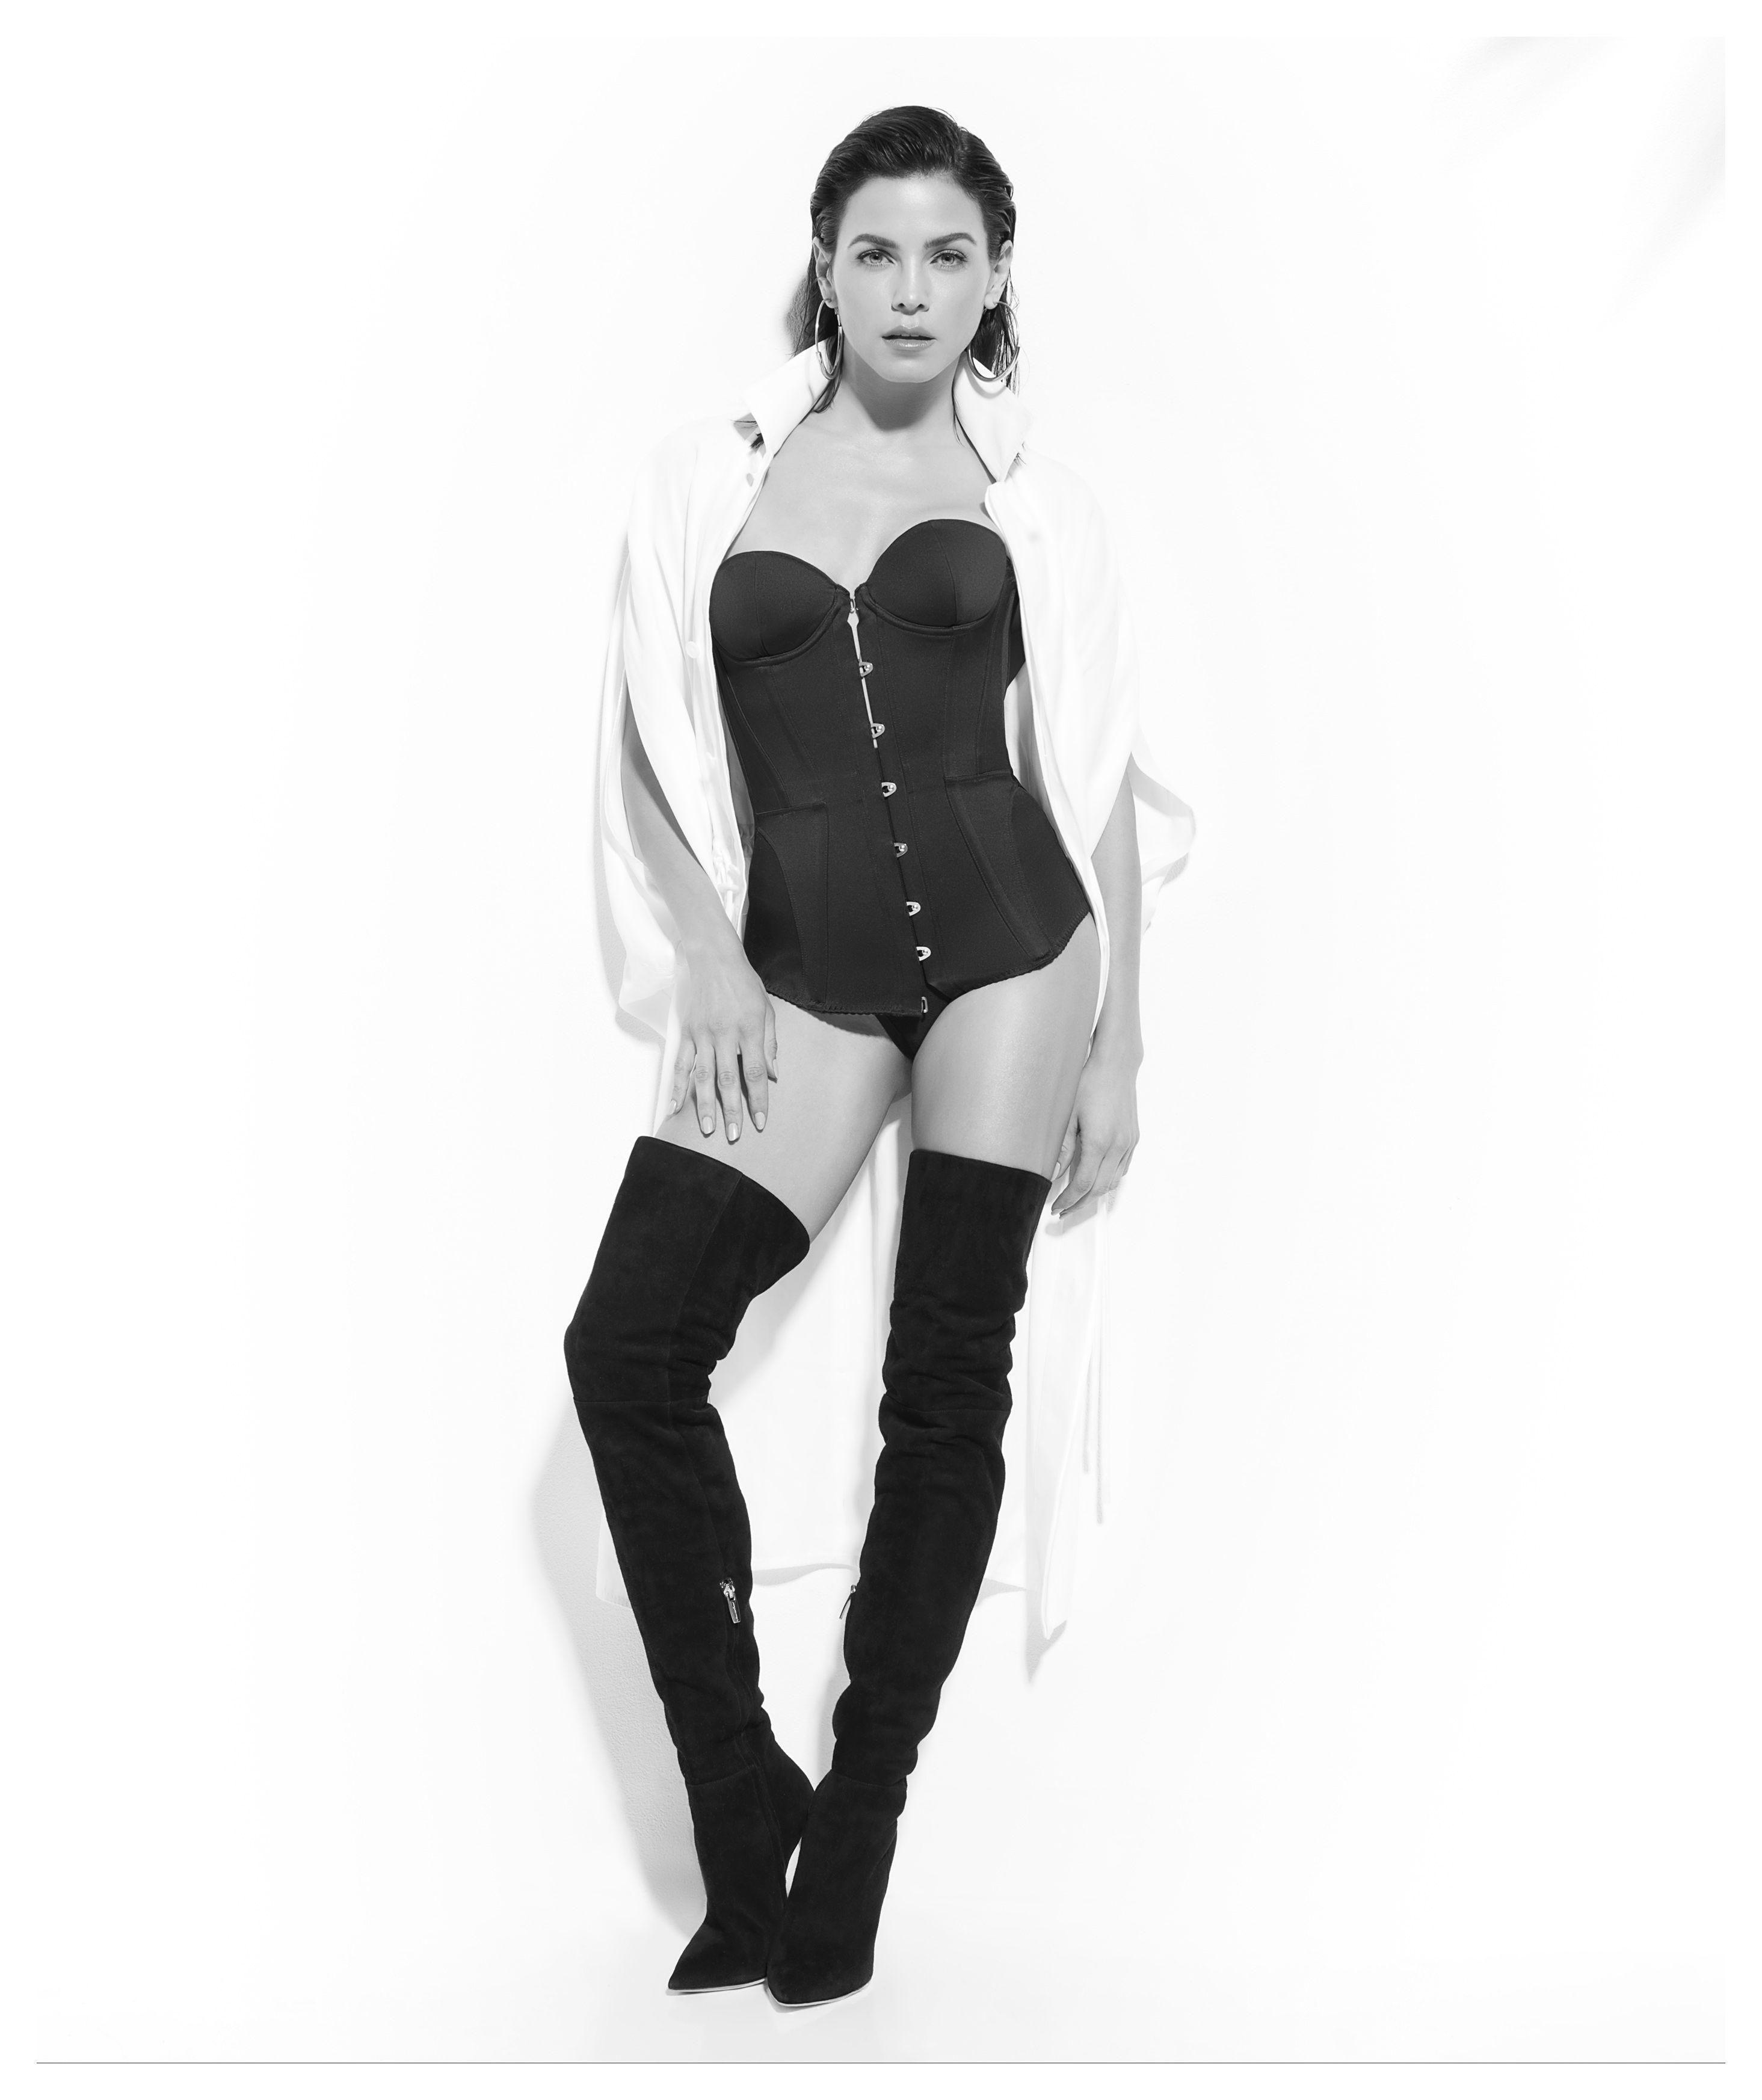 Jenna Dewan Tatum for Prestige Hong Kong